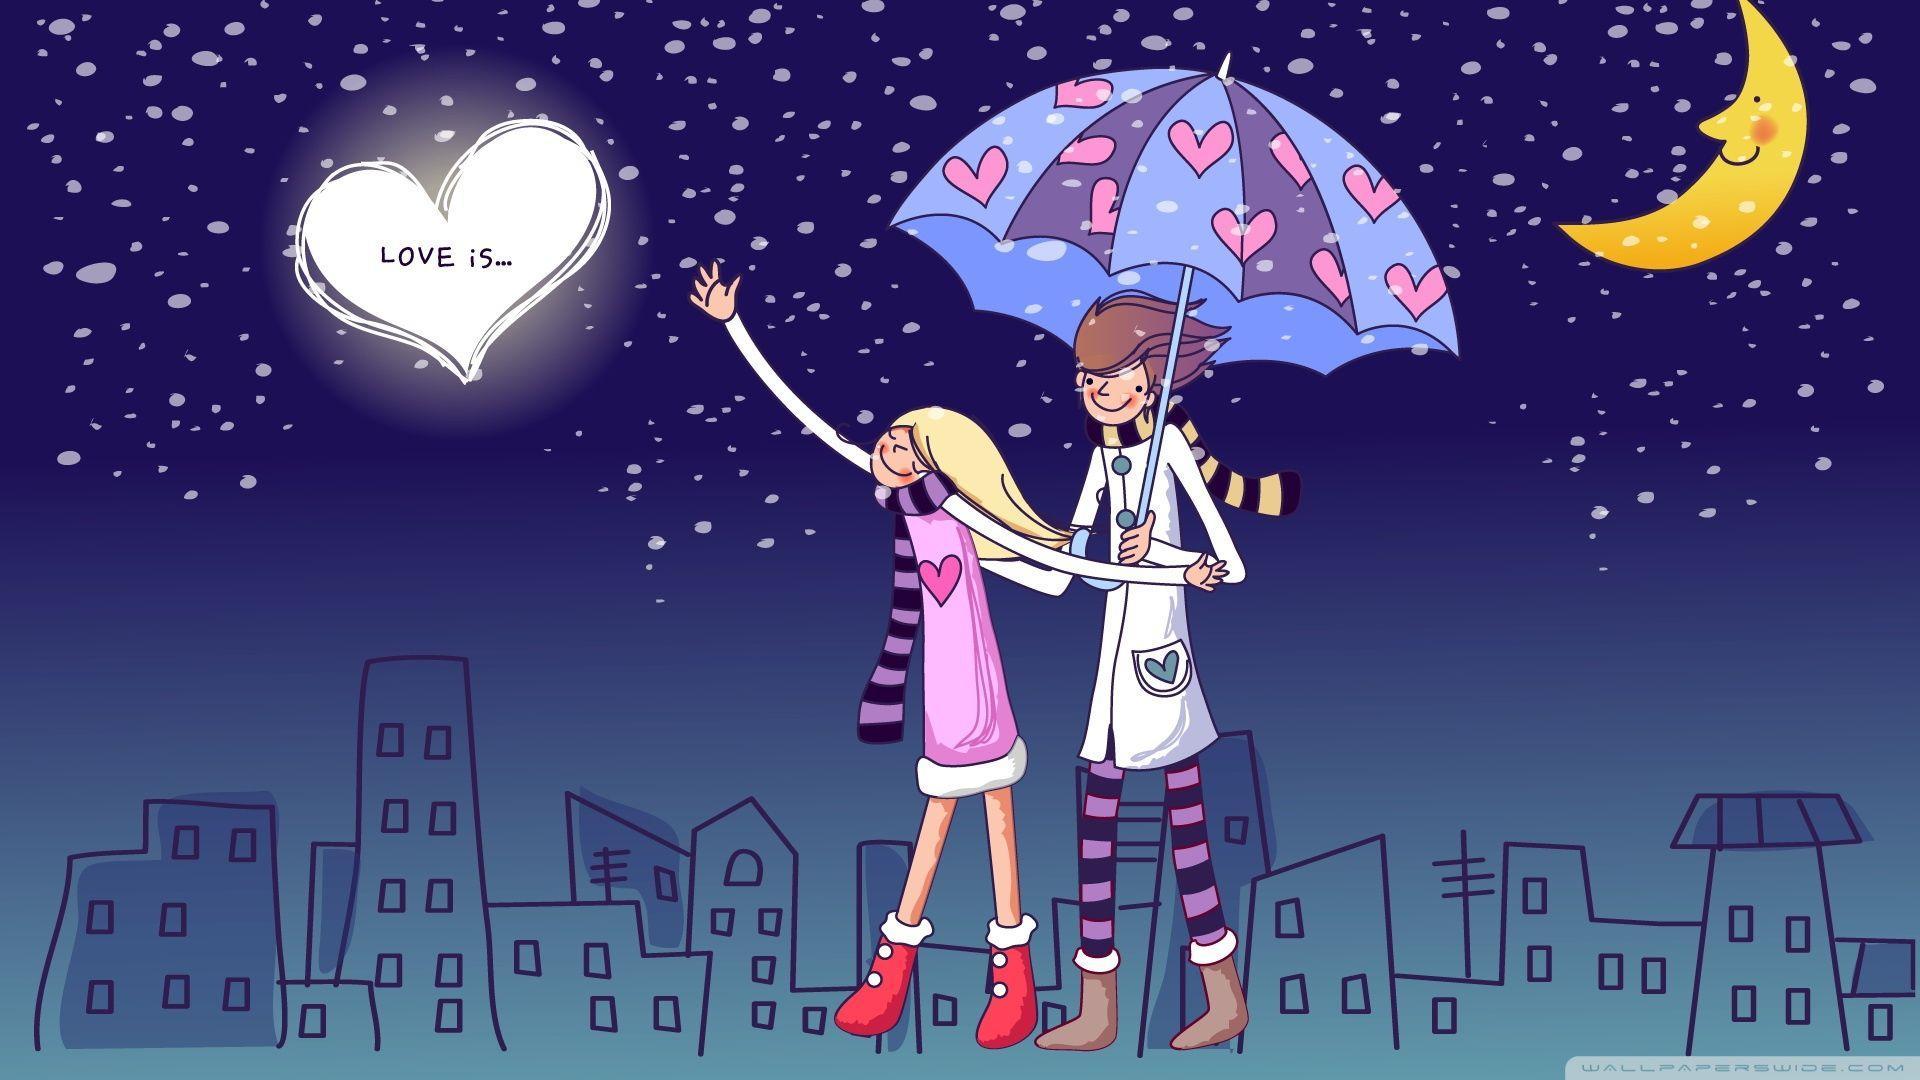 Cartoon Love Hd Wallpapers Wallpaper Cave